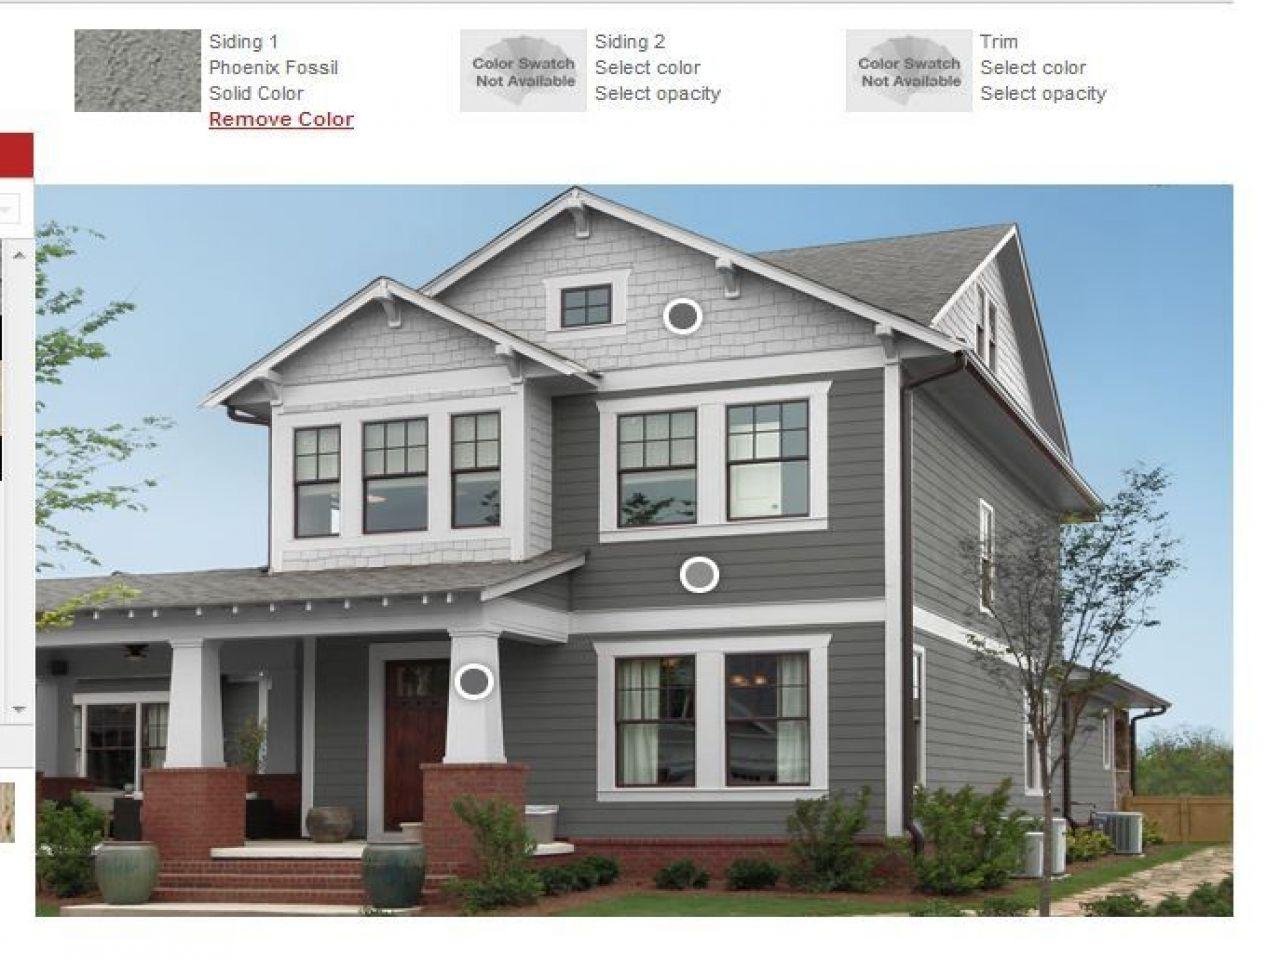 White Brick House With Grey Stone